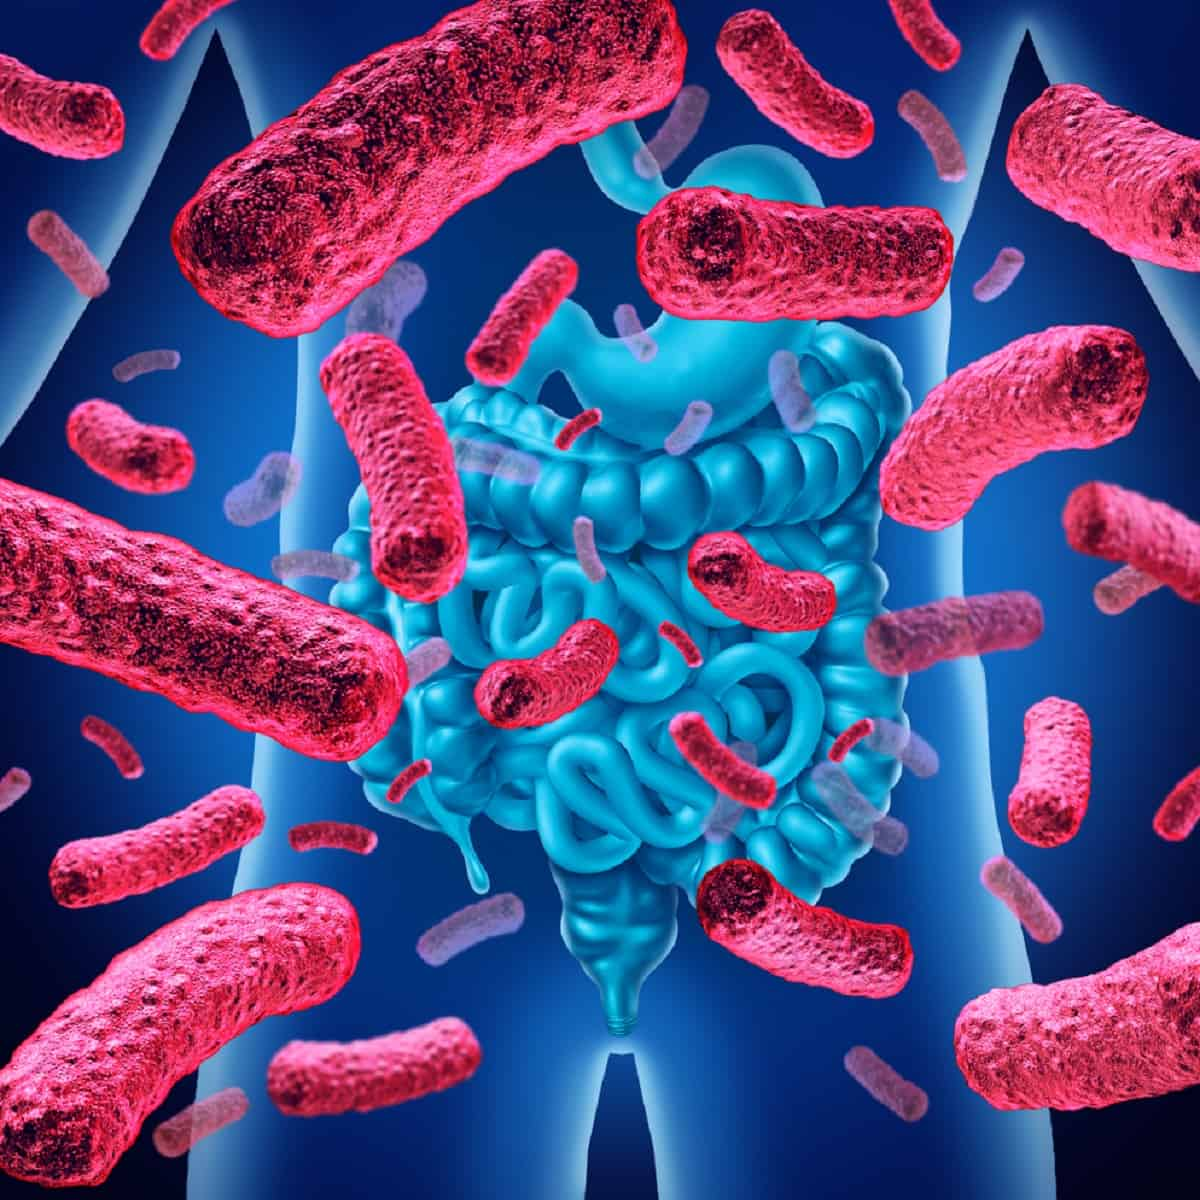 Gastric cancer kills, Daily coronavirus briefing